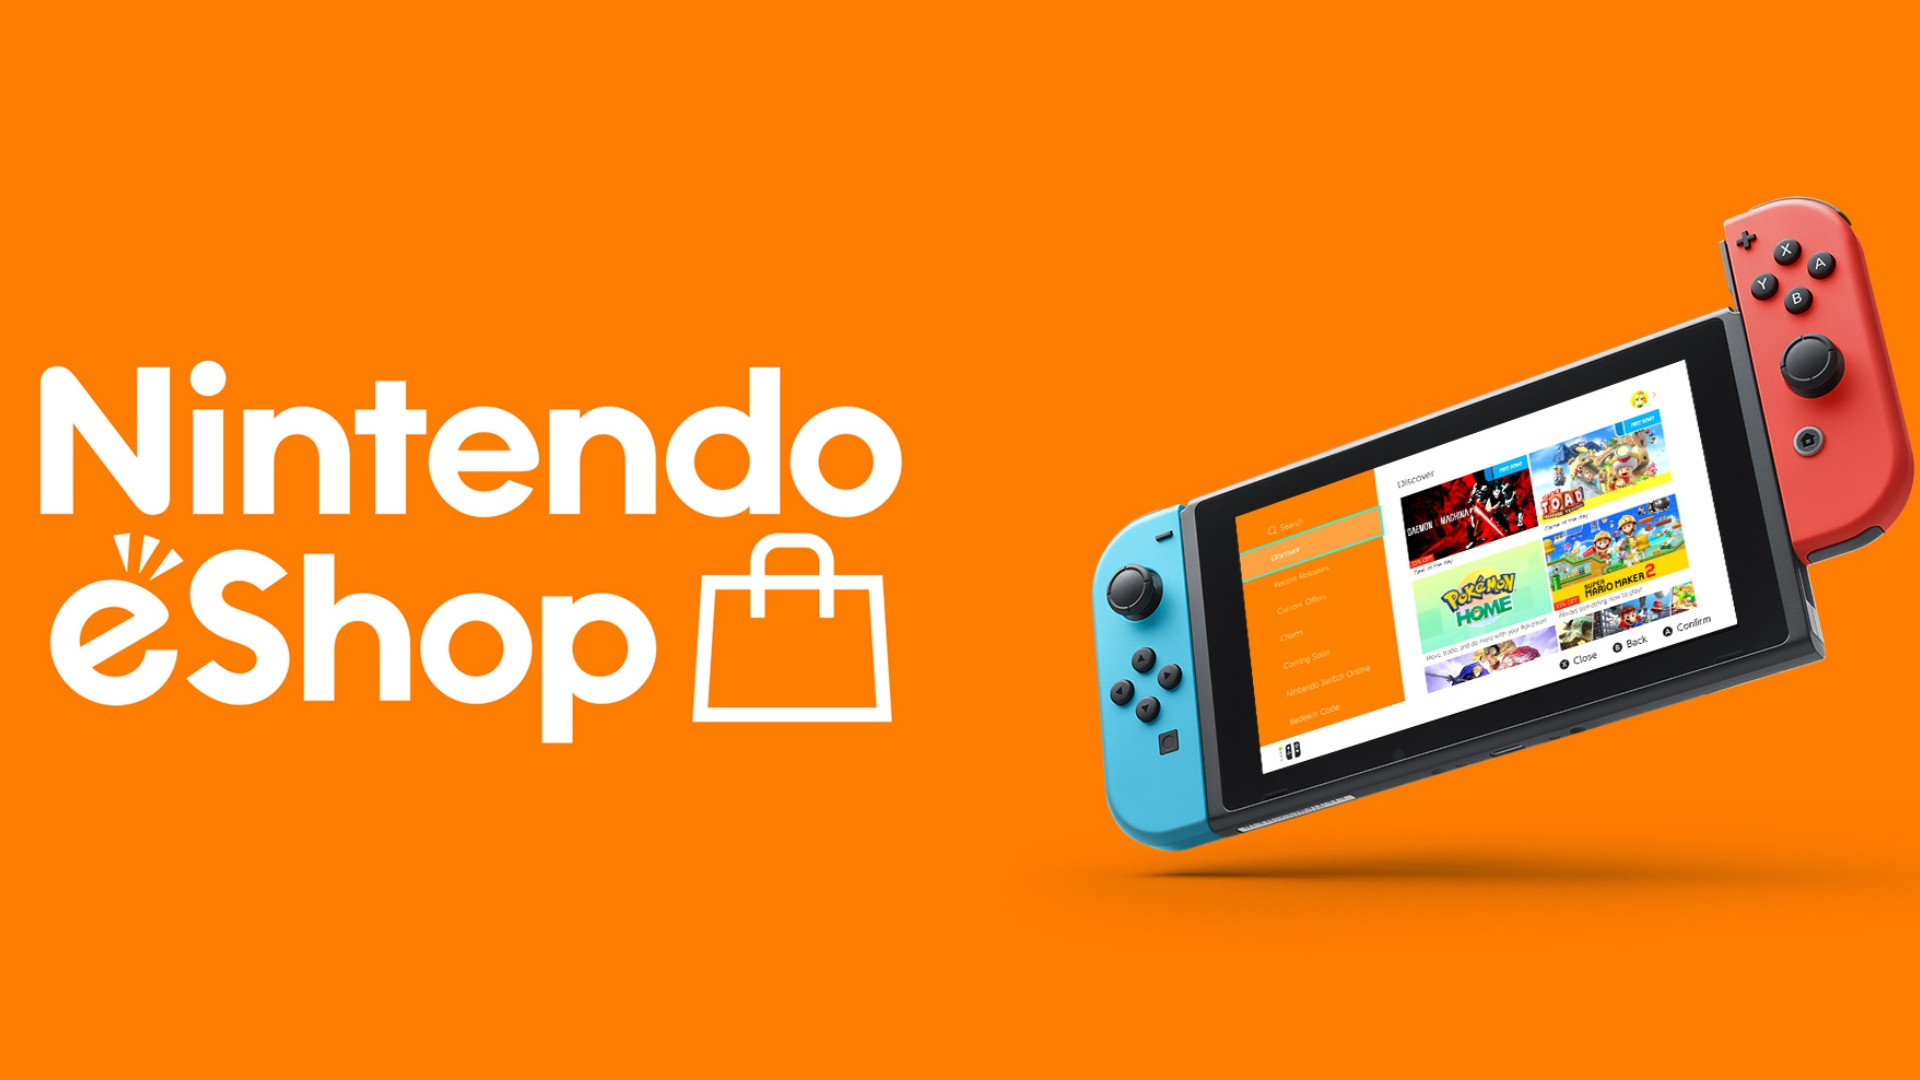 Nintendo eShop - Feature Image